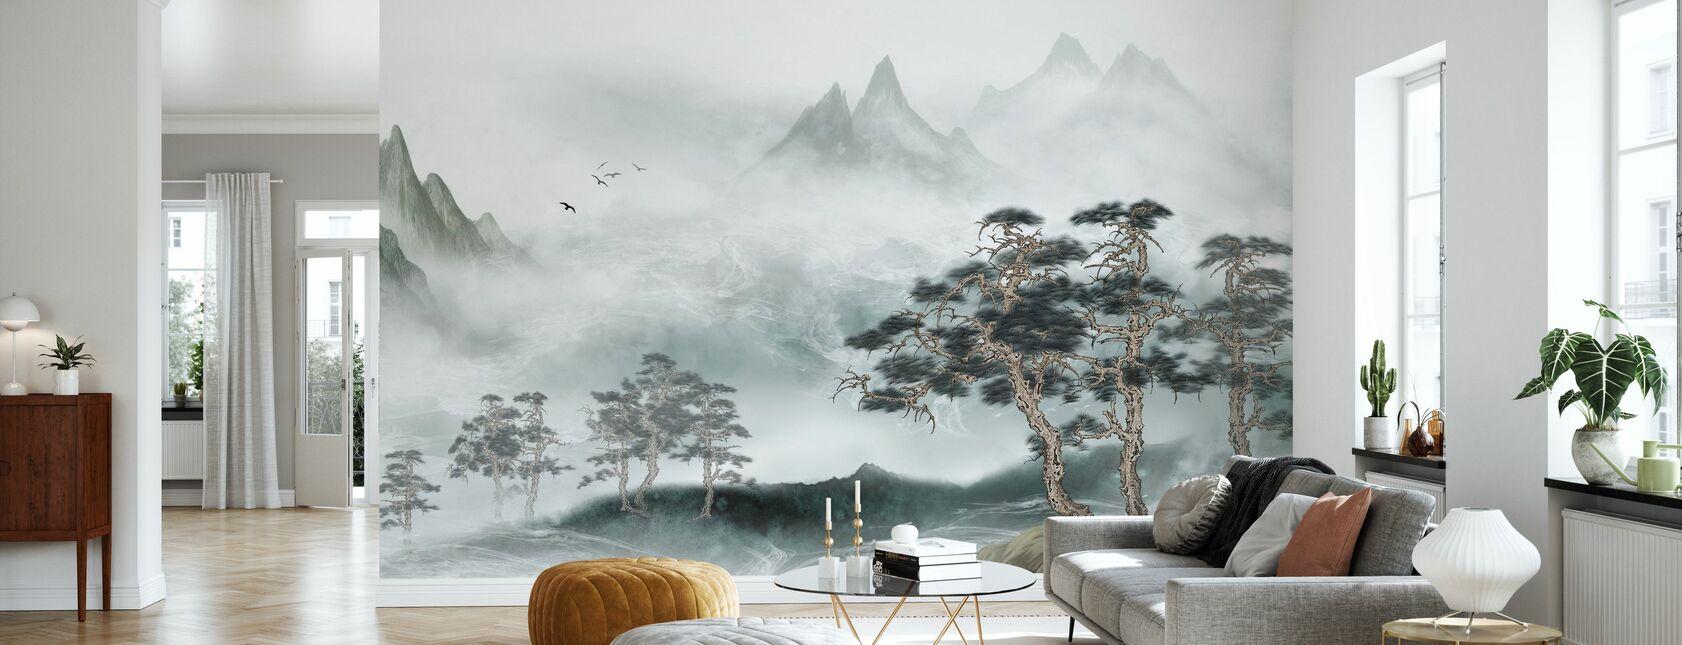 Dimmiga landskap - Tapet - Vardagsrum